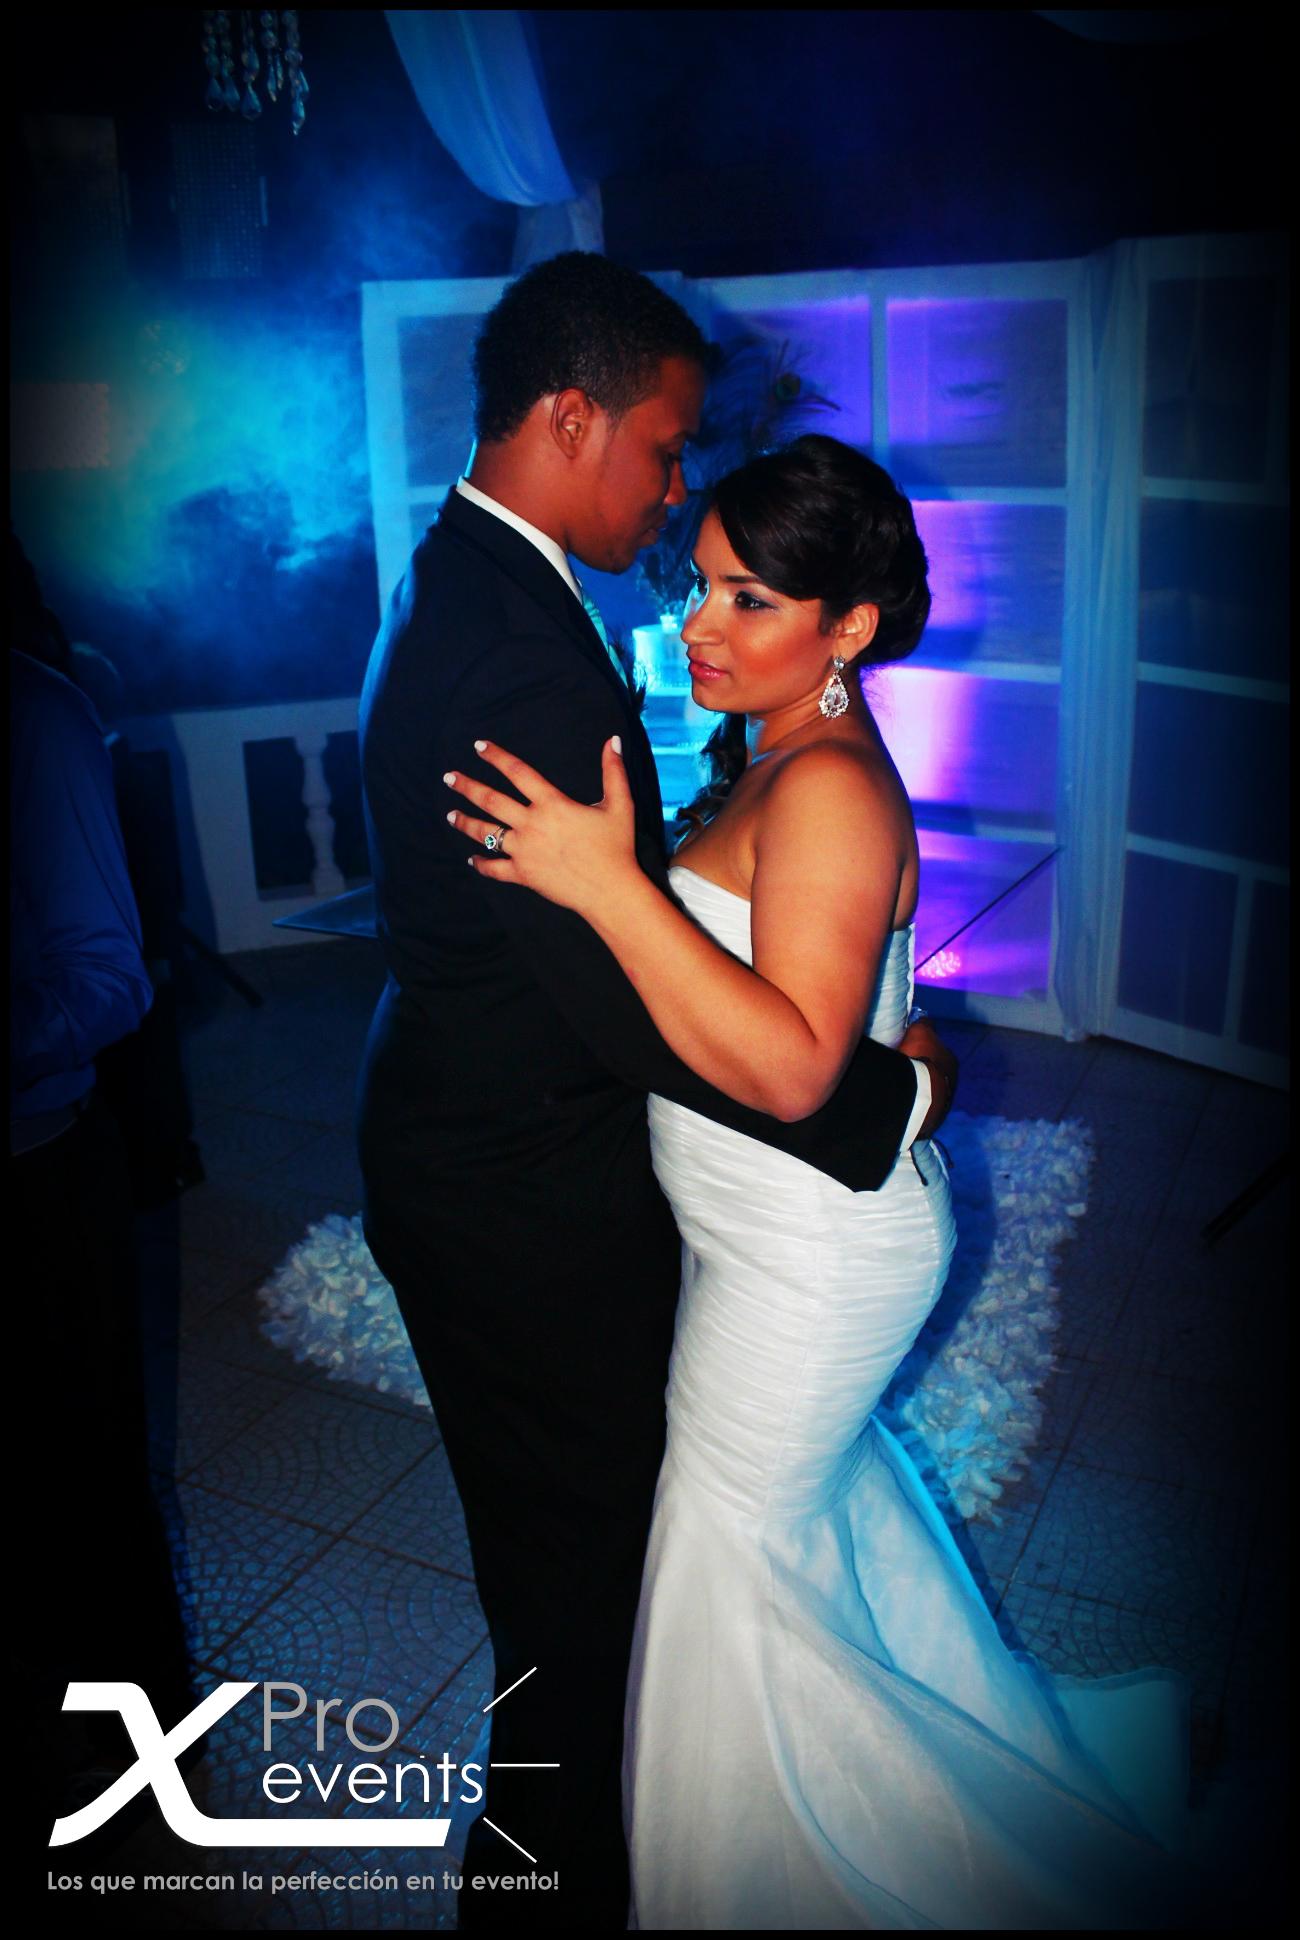 www.Xproevents.com - Expertos en realizacion de bodas.JPG